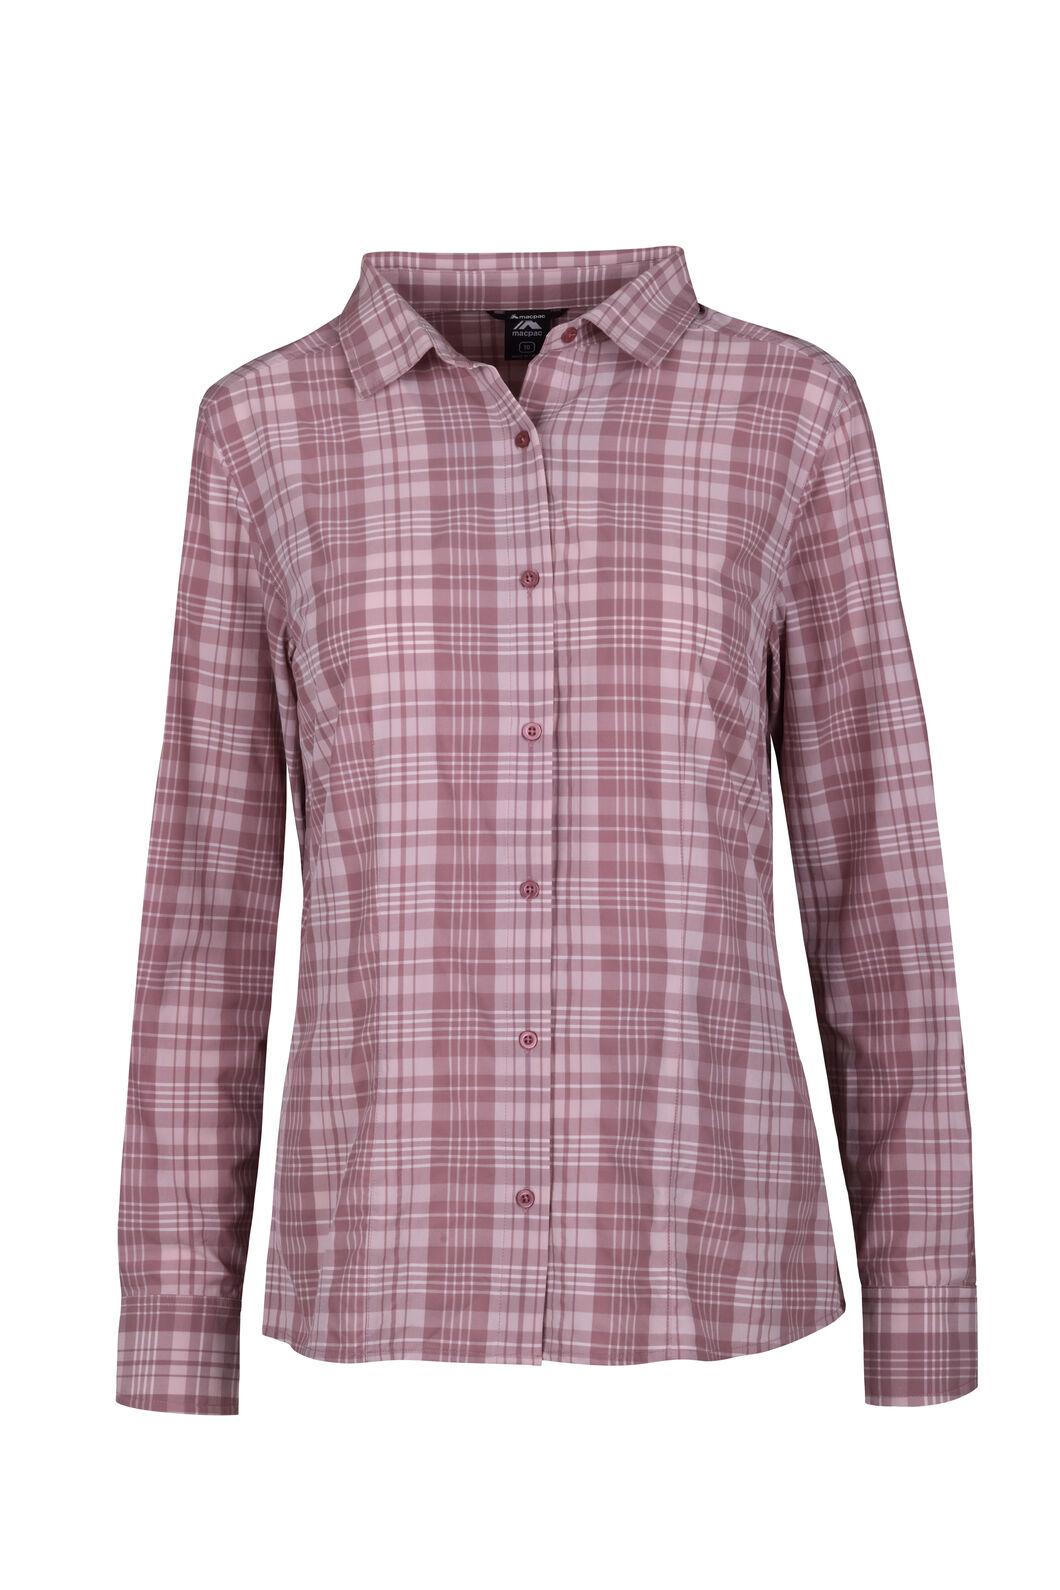 Macpac Eclipse Long Sleeve Shirt - Women's, Nostalgia Rose, hi-res